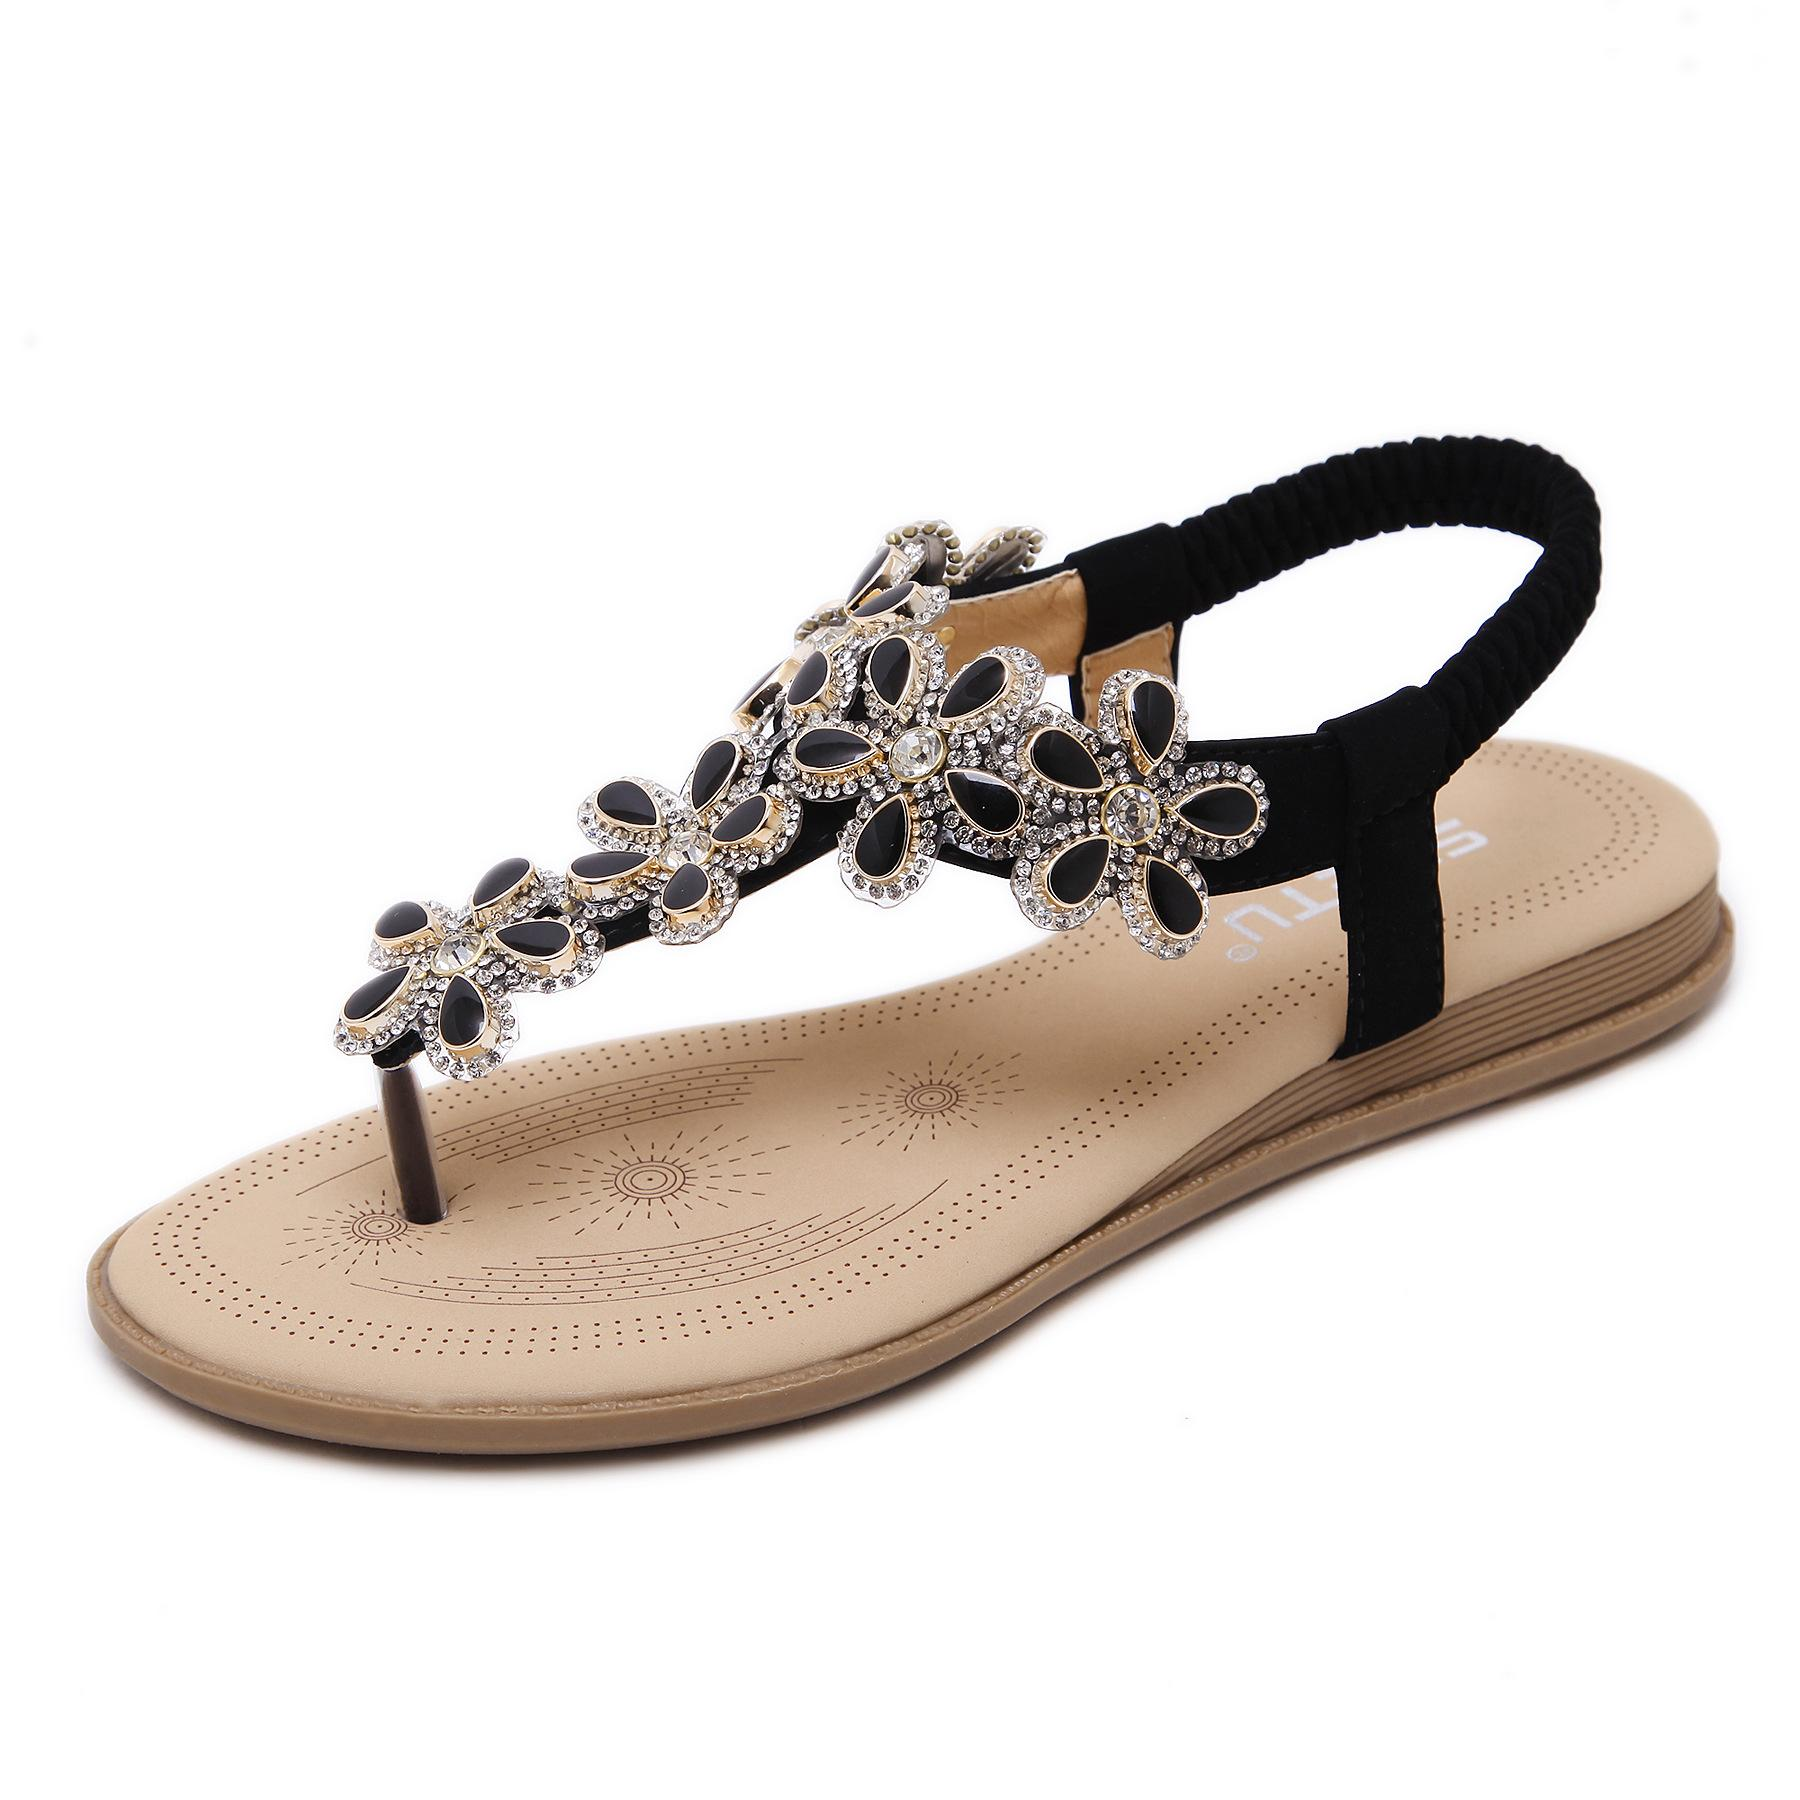 abc24f8a86b New Summer Women Sandals Gladiator Bohemian Flowers Rhinestone Flat Roman  Ladies Shoes Flip Flops Big Size Sandalias Mujer Sexy Shoes Sandels From  Shoes2244 ...